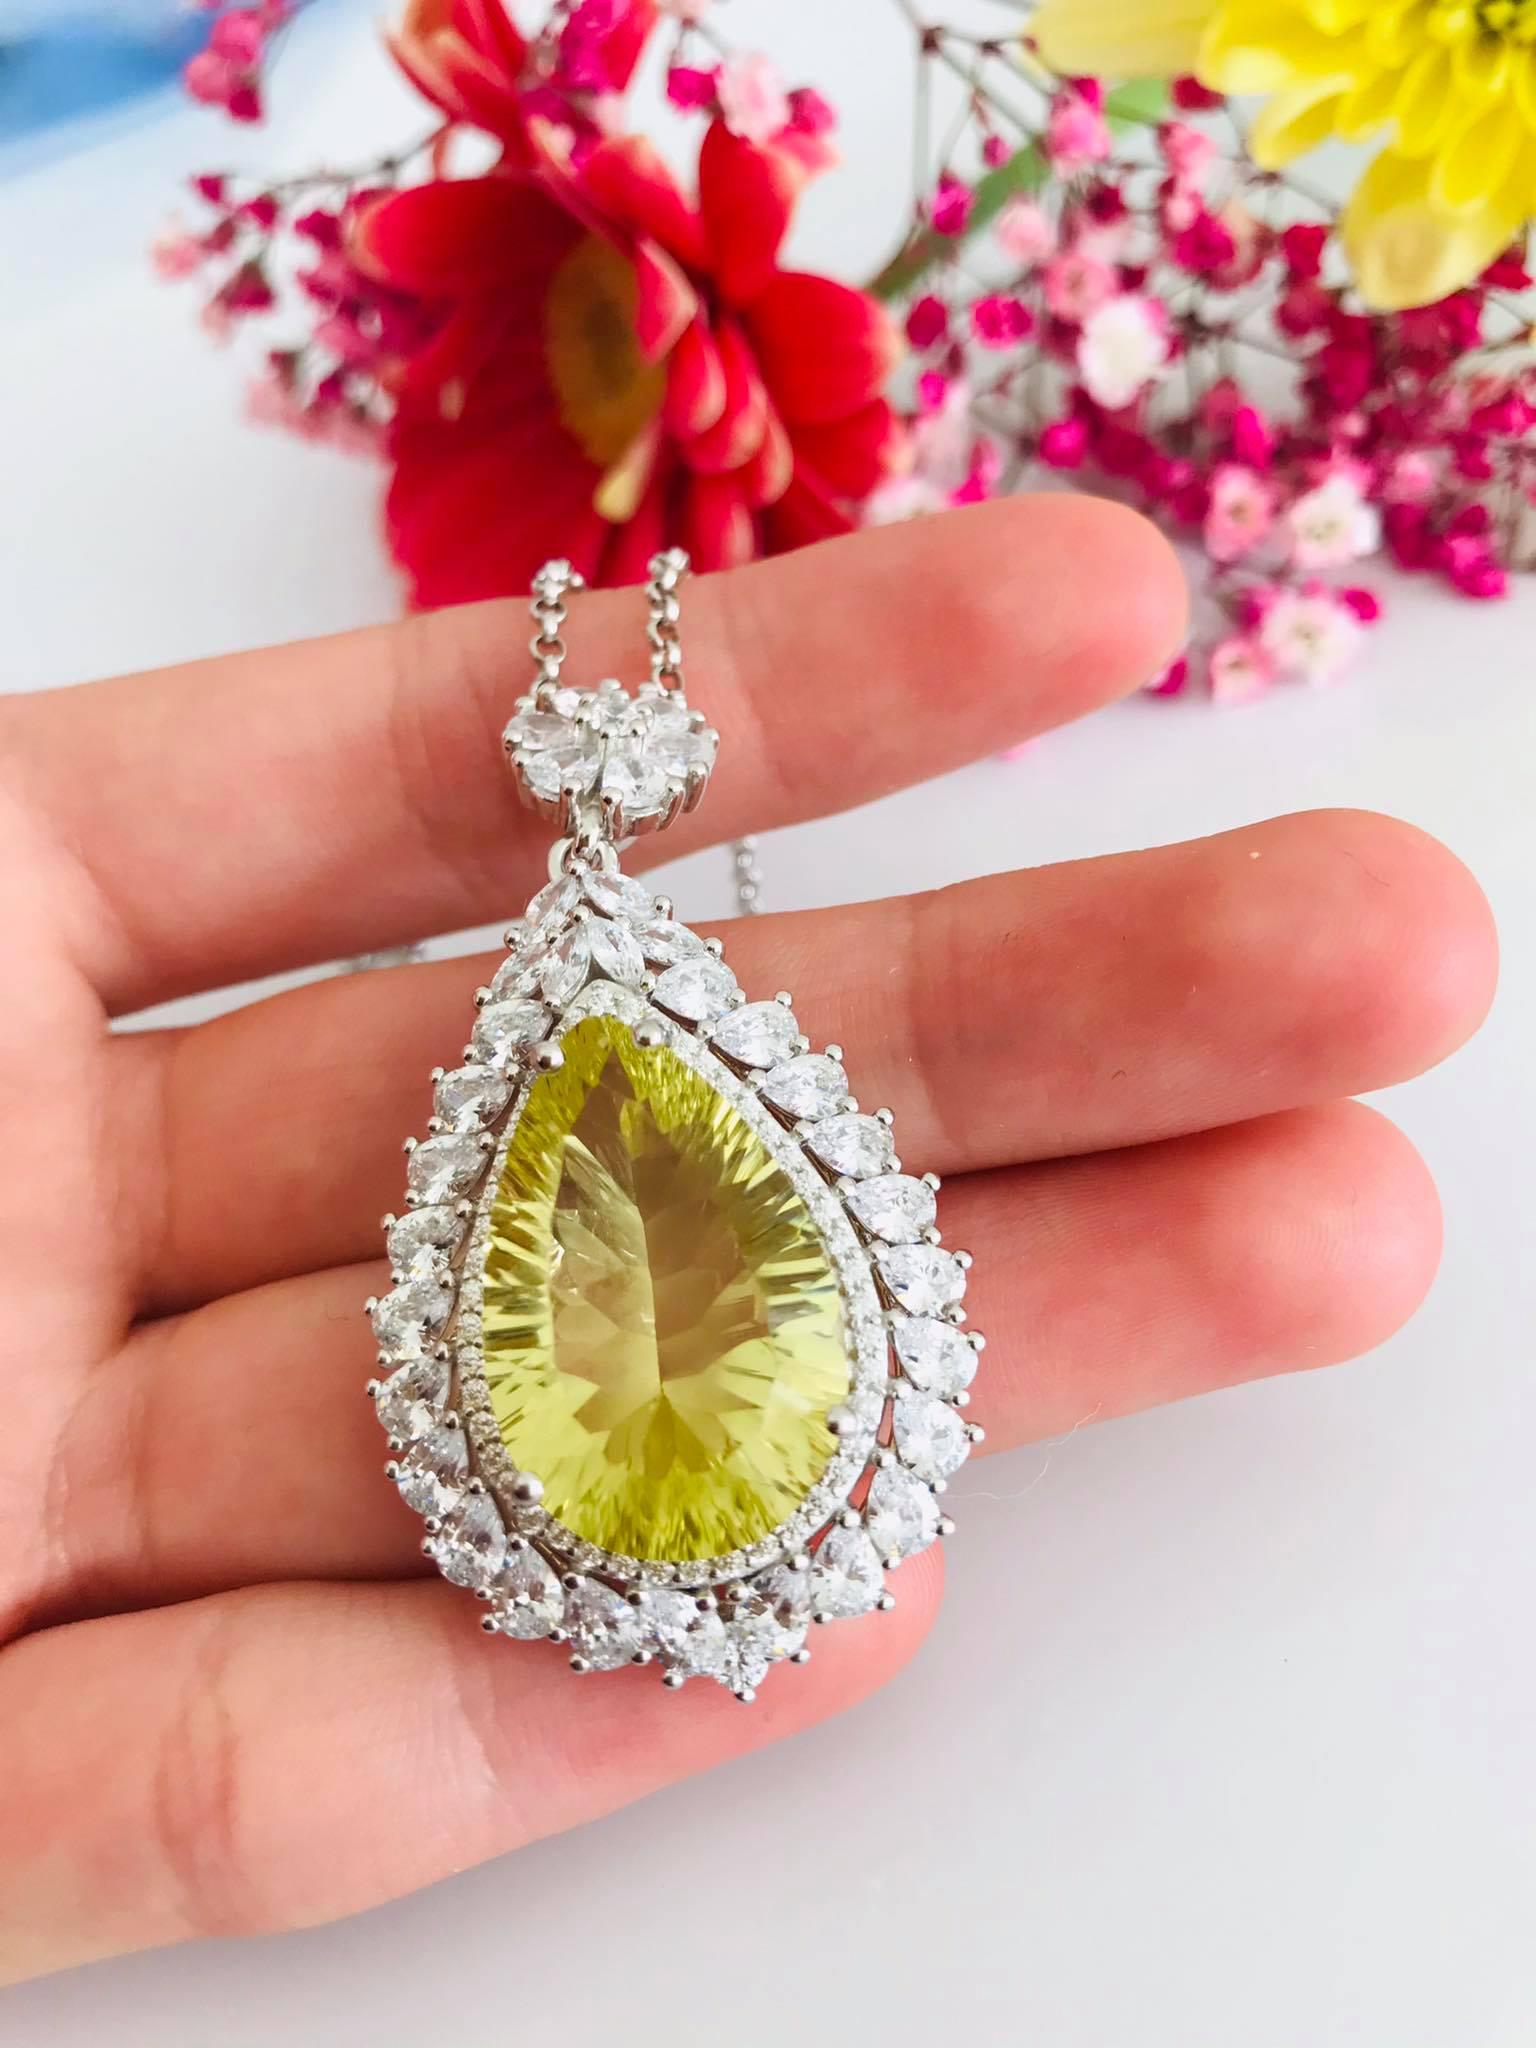 Large Brilliant Pear Shape Diamond cut Lemon Topaz Surrounded by Simulated Diamonds Necklace Image